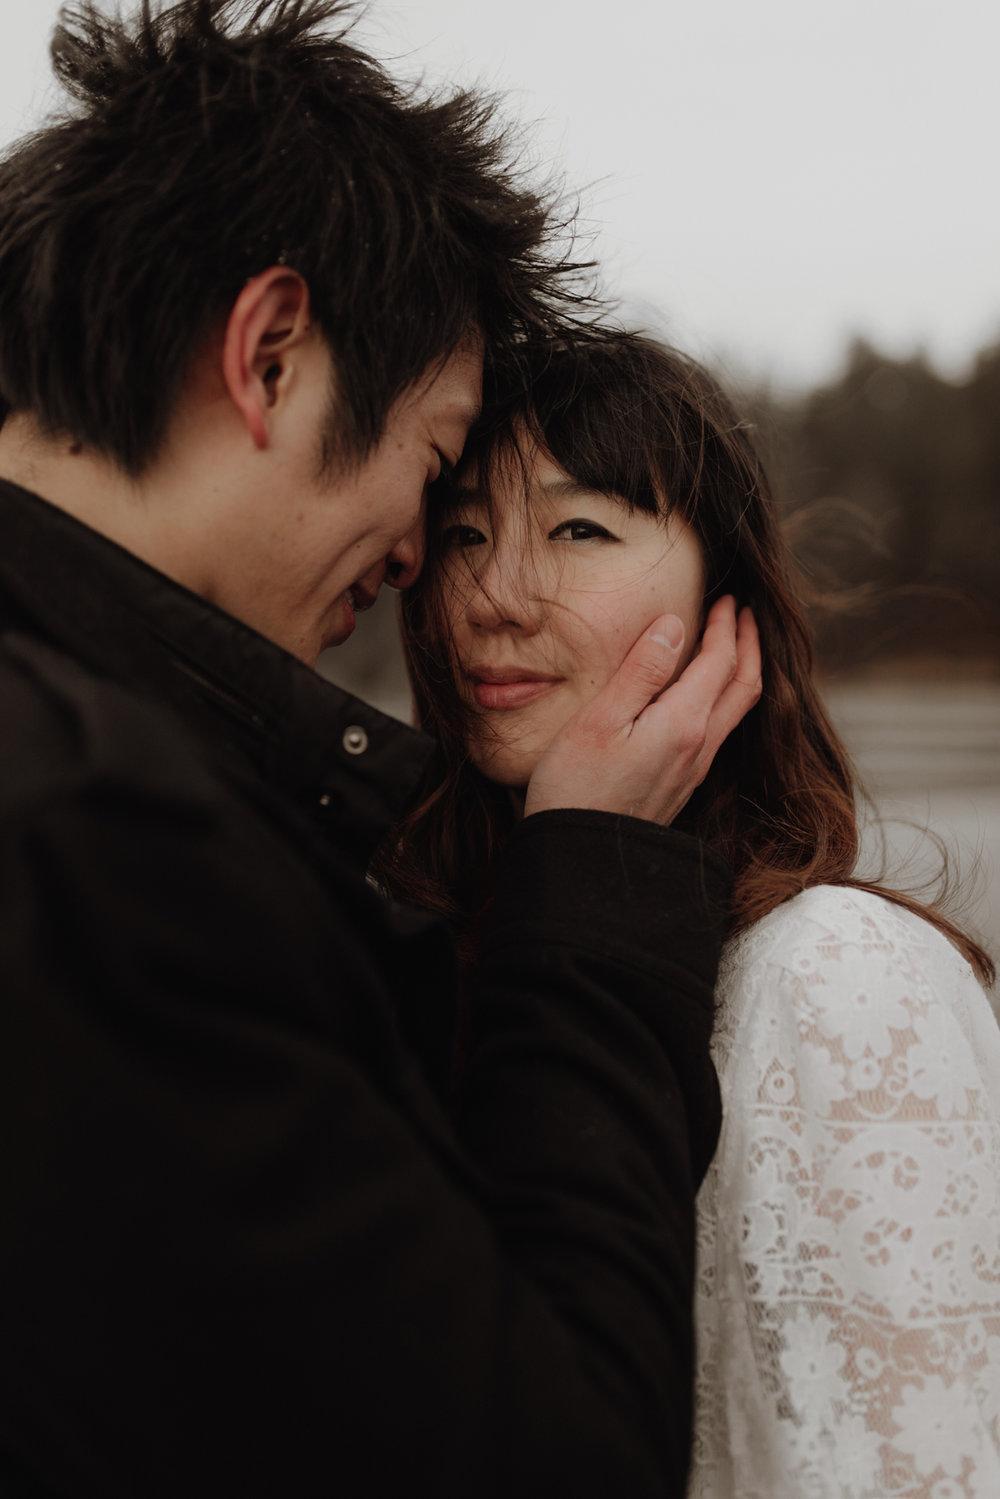 seattle-wedding-photographer-kerouac-0193.jpg